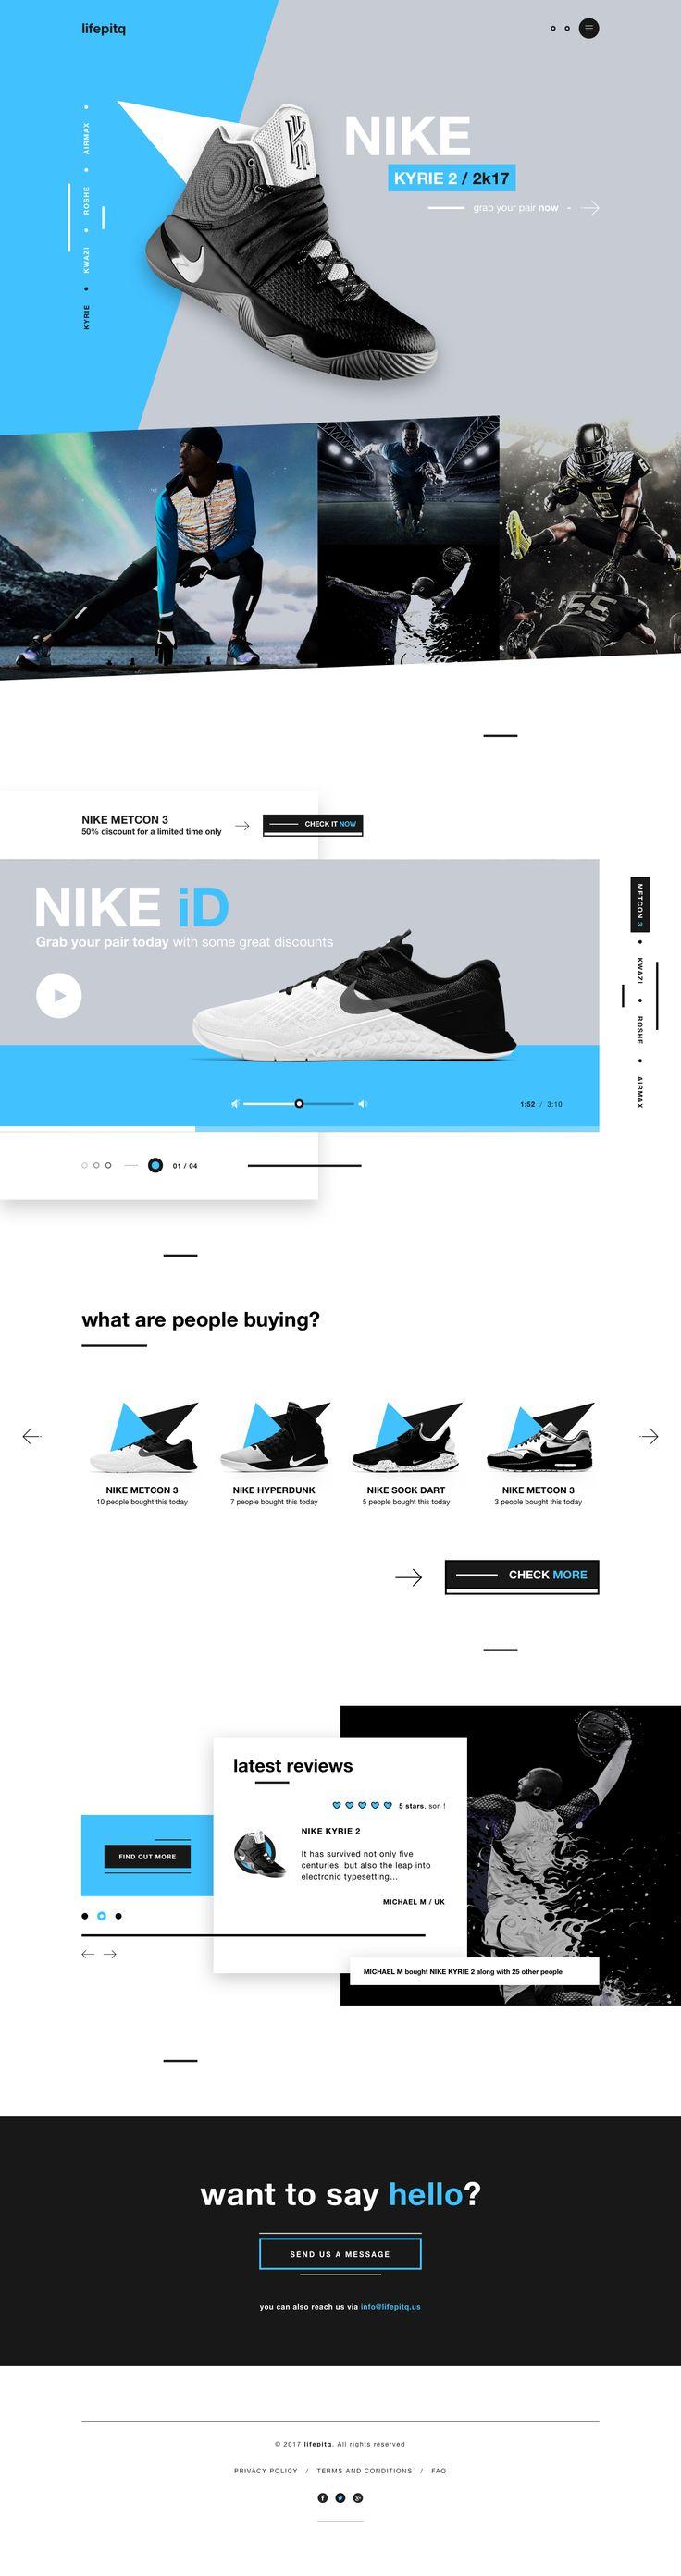 Dribbble - pitq-shoe-nike-shop-website-landing-page-design-ui-ux-dribbble-full-2.jpg by Robert Berki